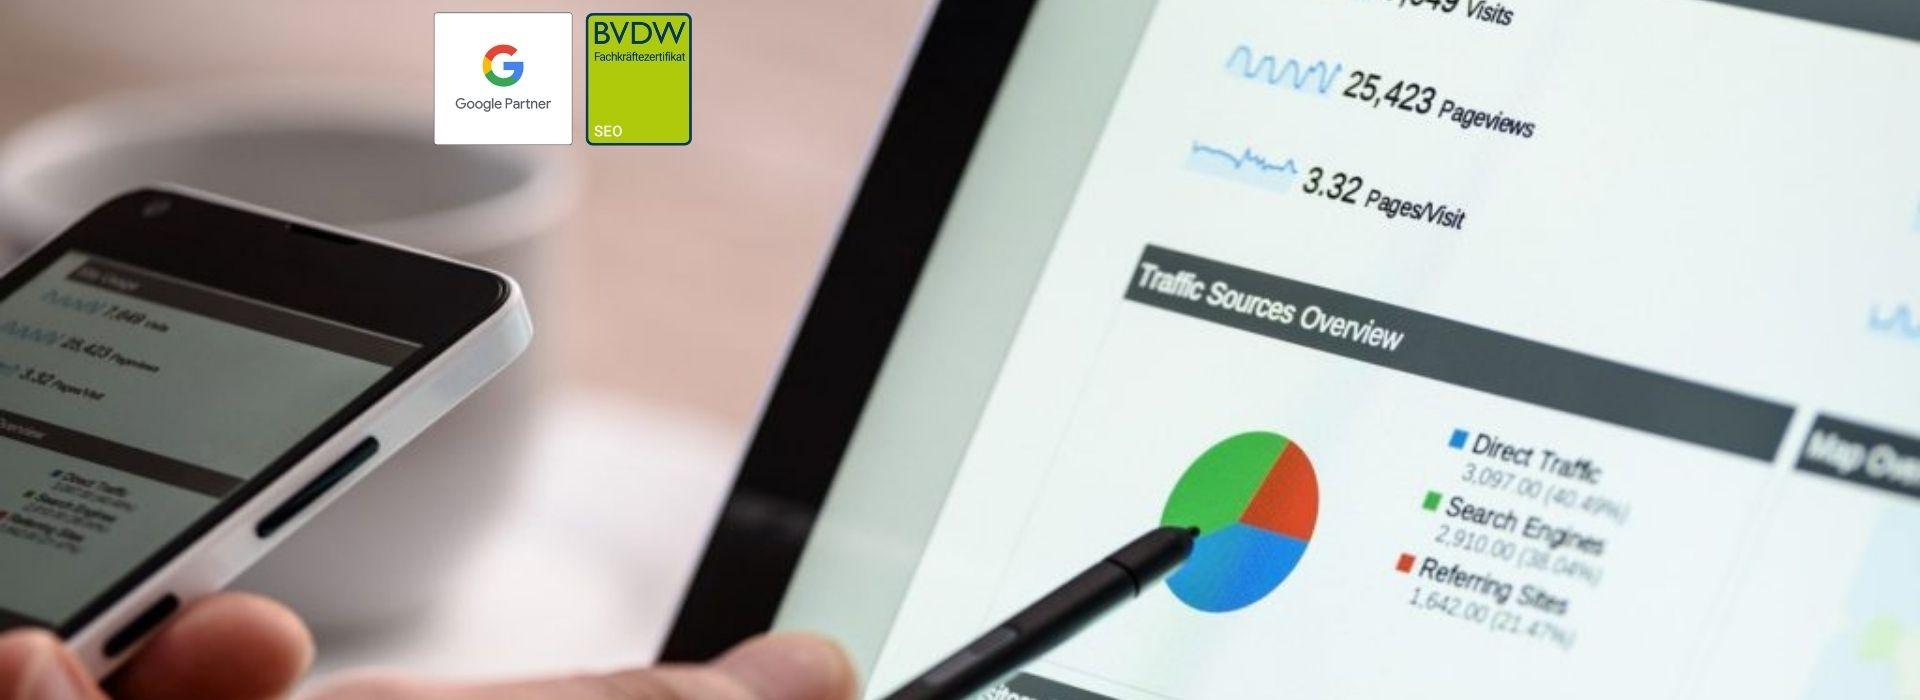 Online Marketing Strategy -  SEO, SEA, Marketing Beratung, Websites in Stuttgart und Umgebung